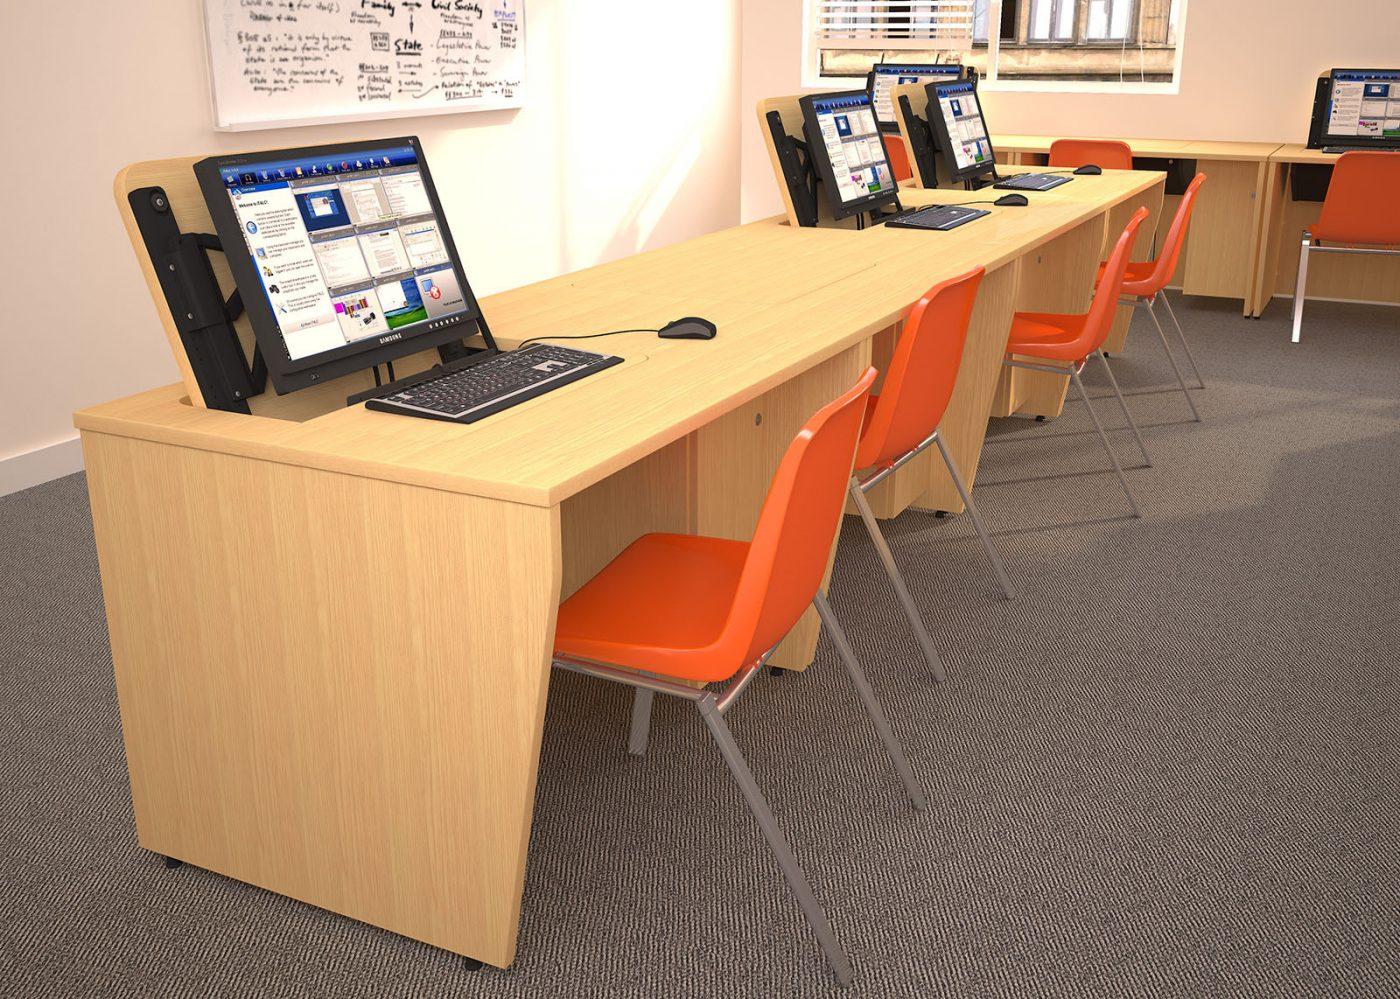 IT desk, school furniture, classroom furniture, bank of desks